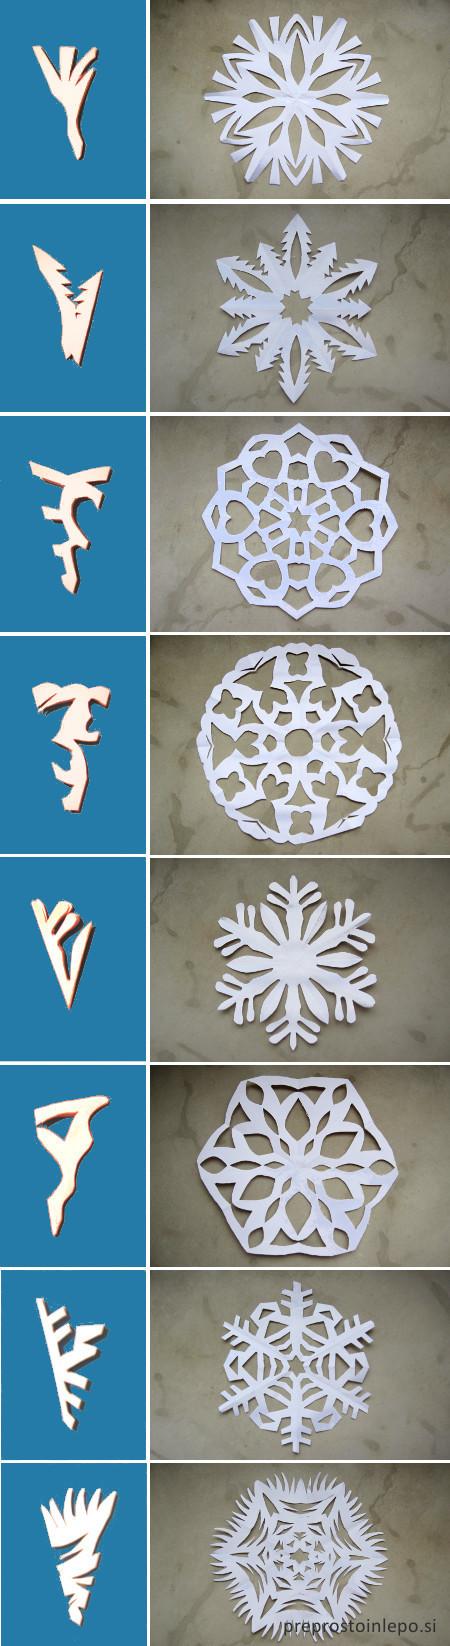 snežinke vzorci